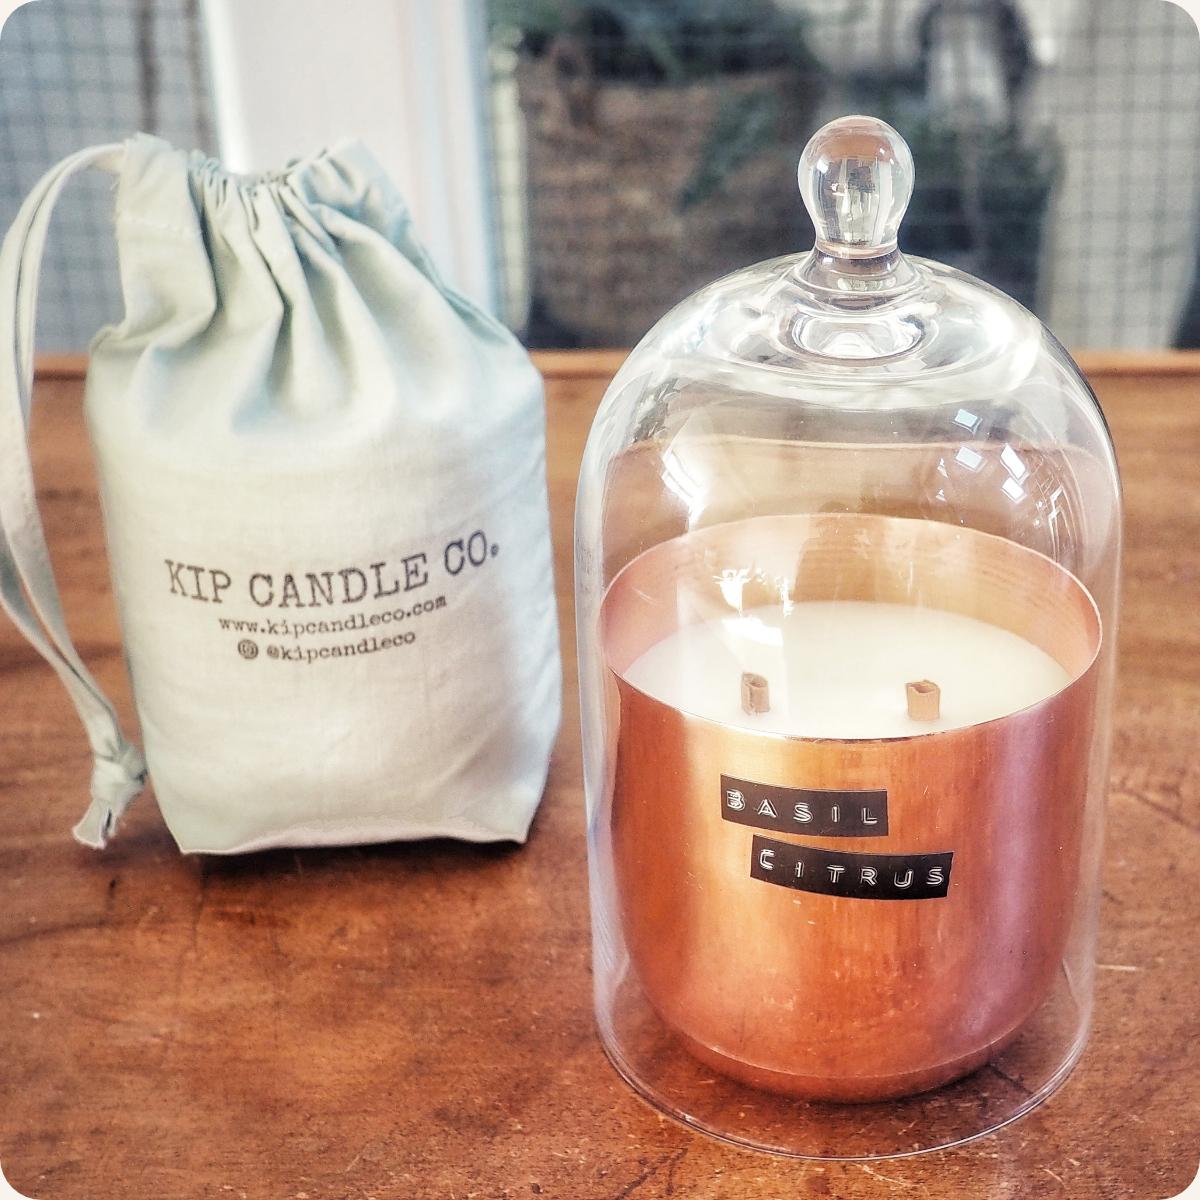 Basil Citrus Original Copper & Bell Jar Bundle.